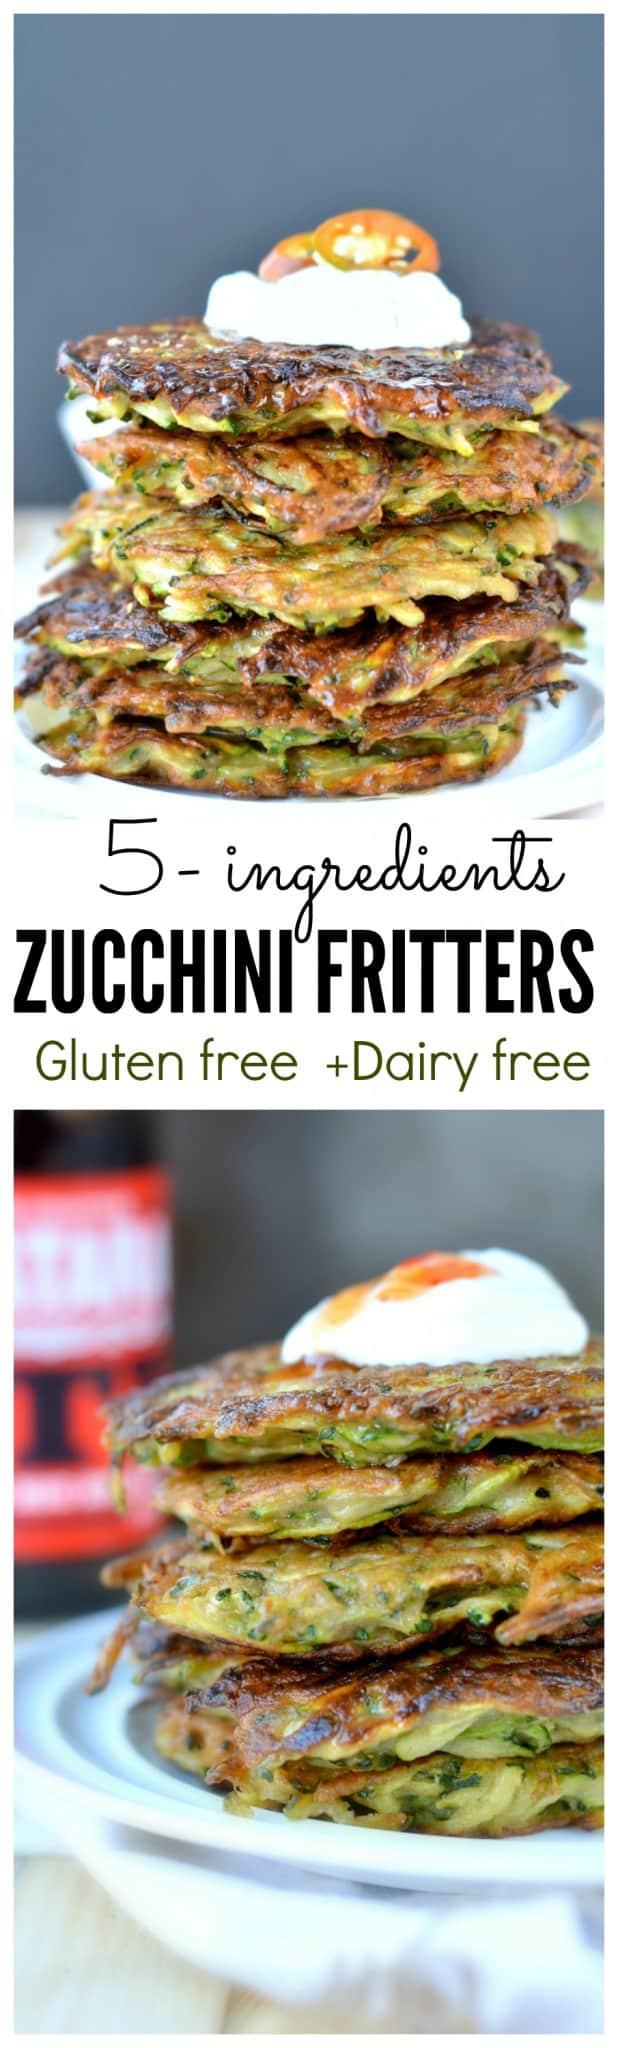 zucchini fritters gluten free dairy free